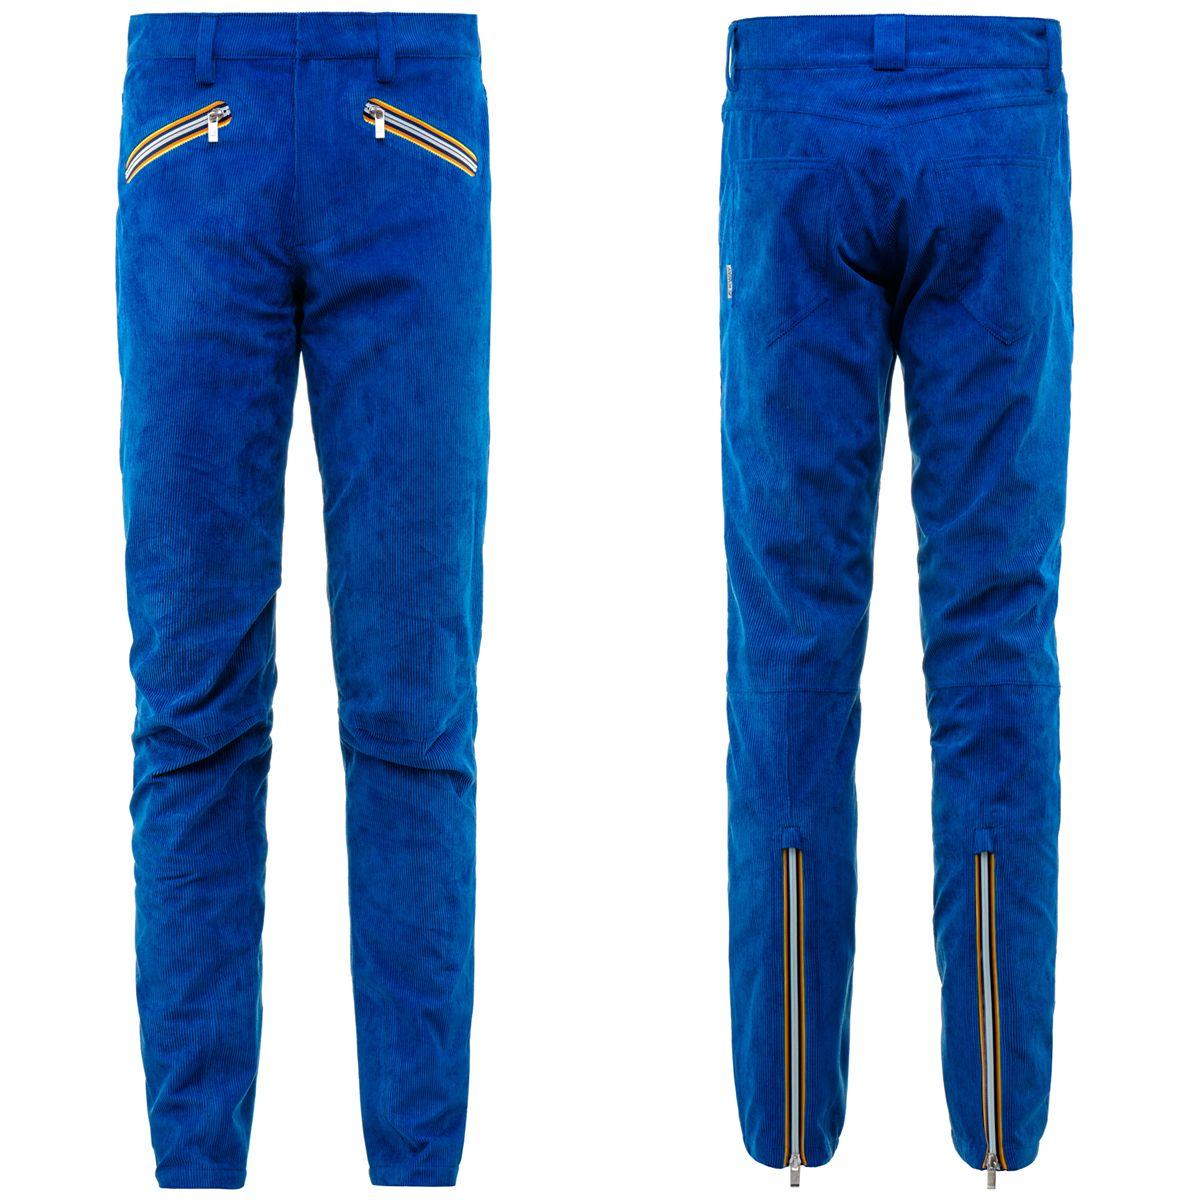 K-Way Pantaloni ALEN CORDUROY 4 Tasche Uomo